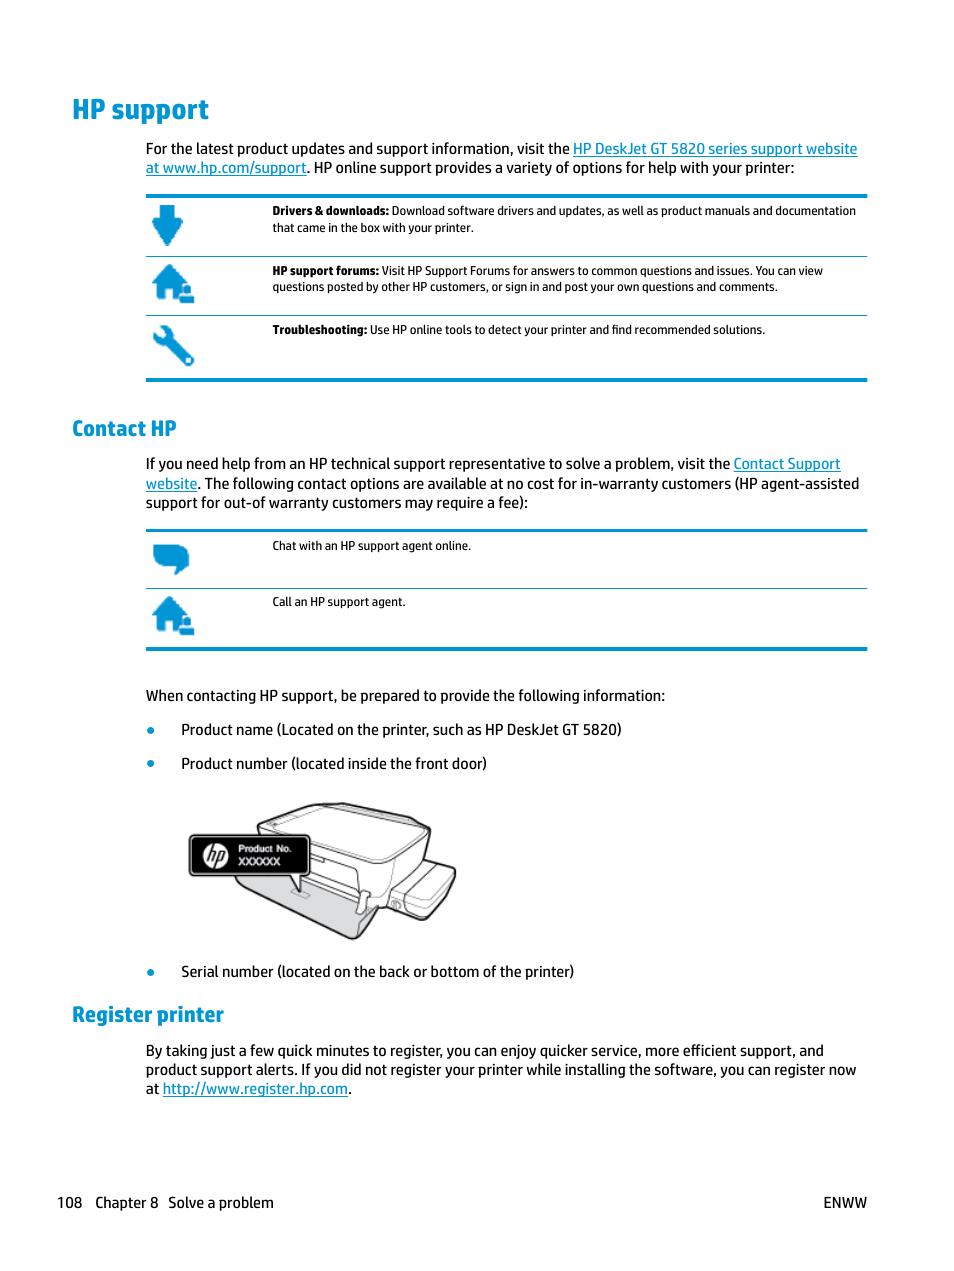 hp support contact hp register printer hp deskjet gt 5820 user rh manualsdir com Parts Manual HP Officejet All One Printer